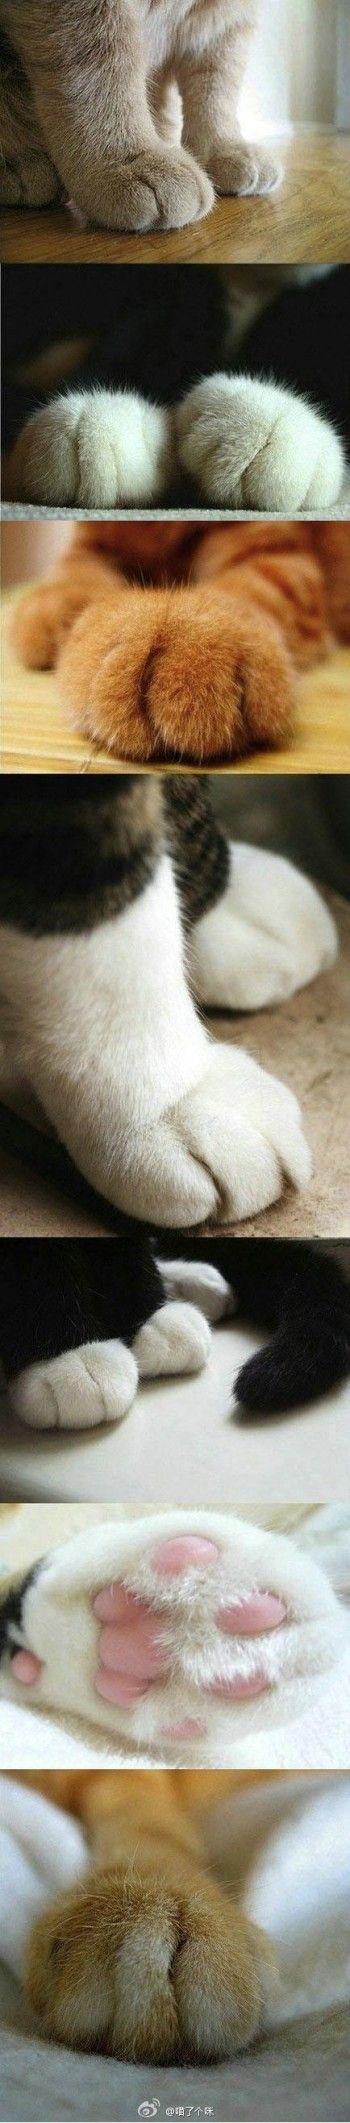 love those kitty feets